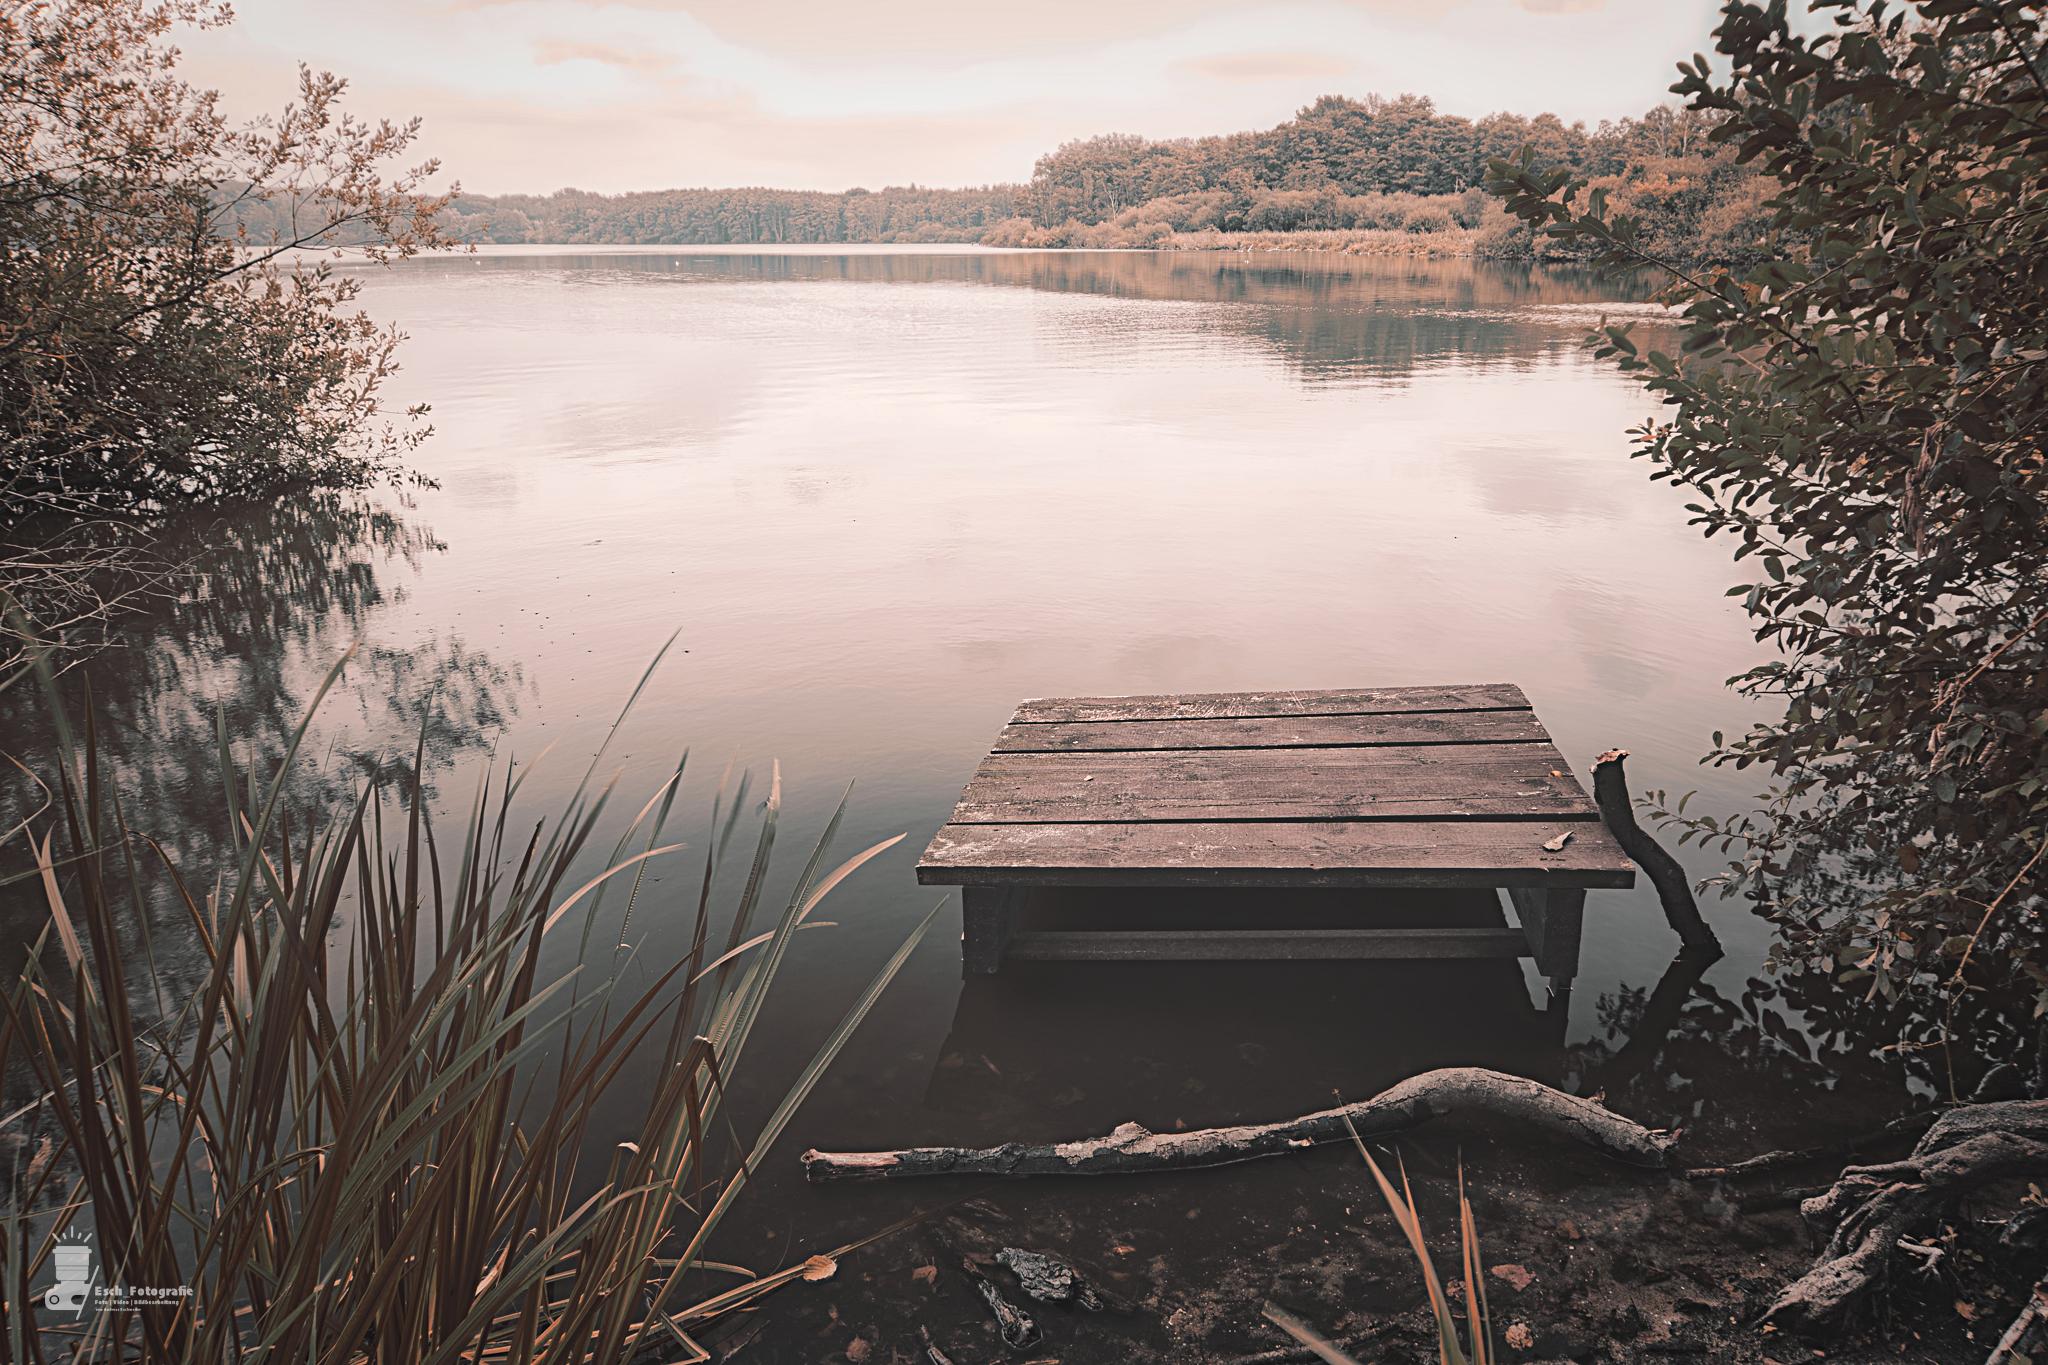 Krickenbecker Lakes, Germany